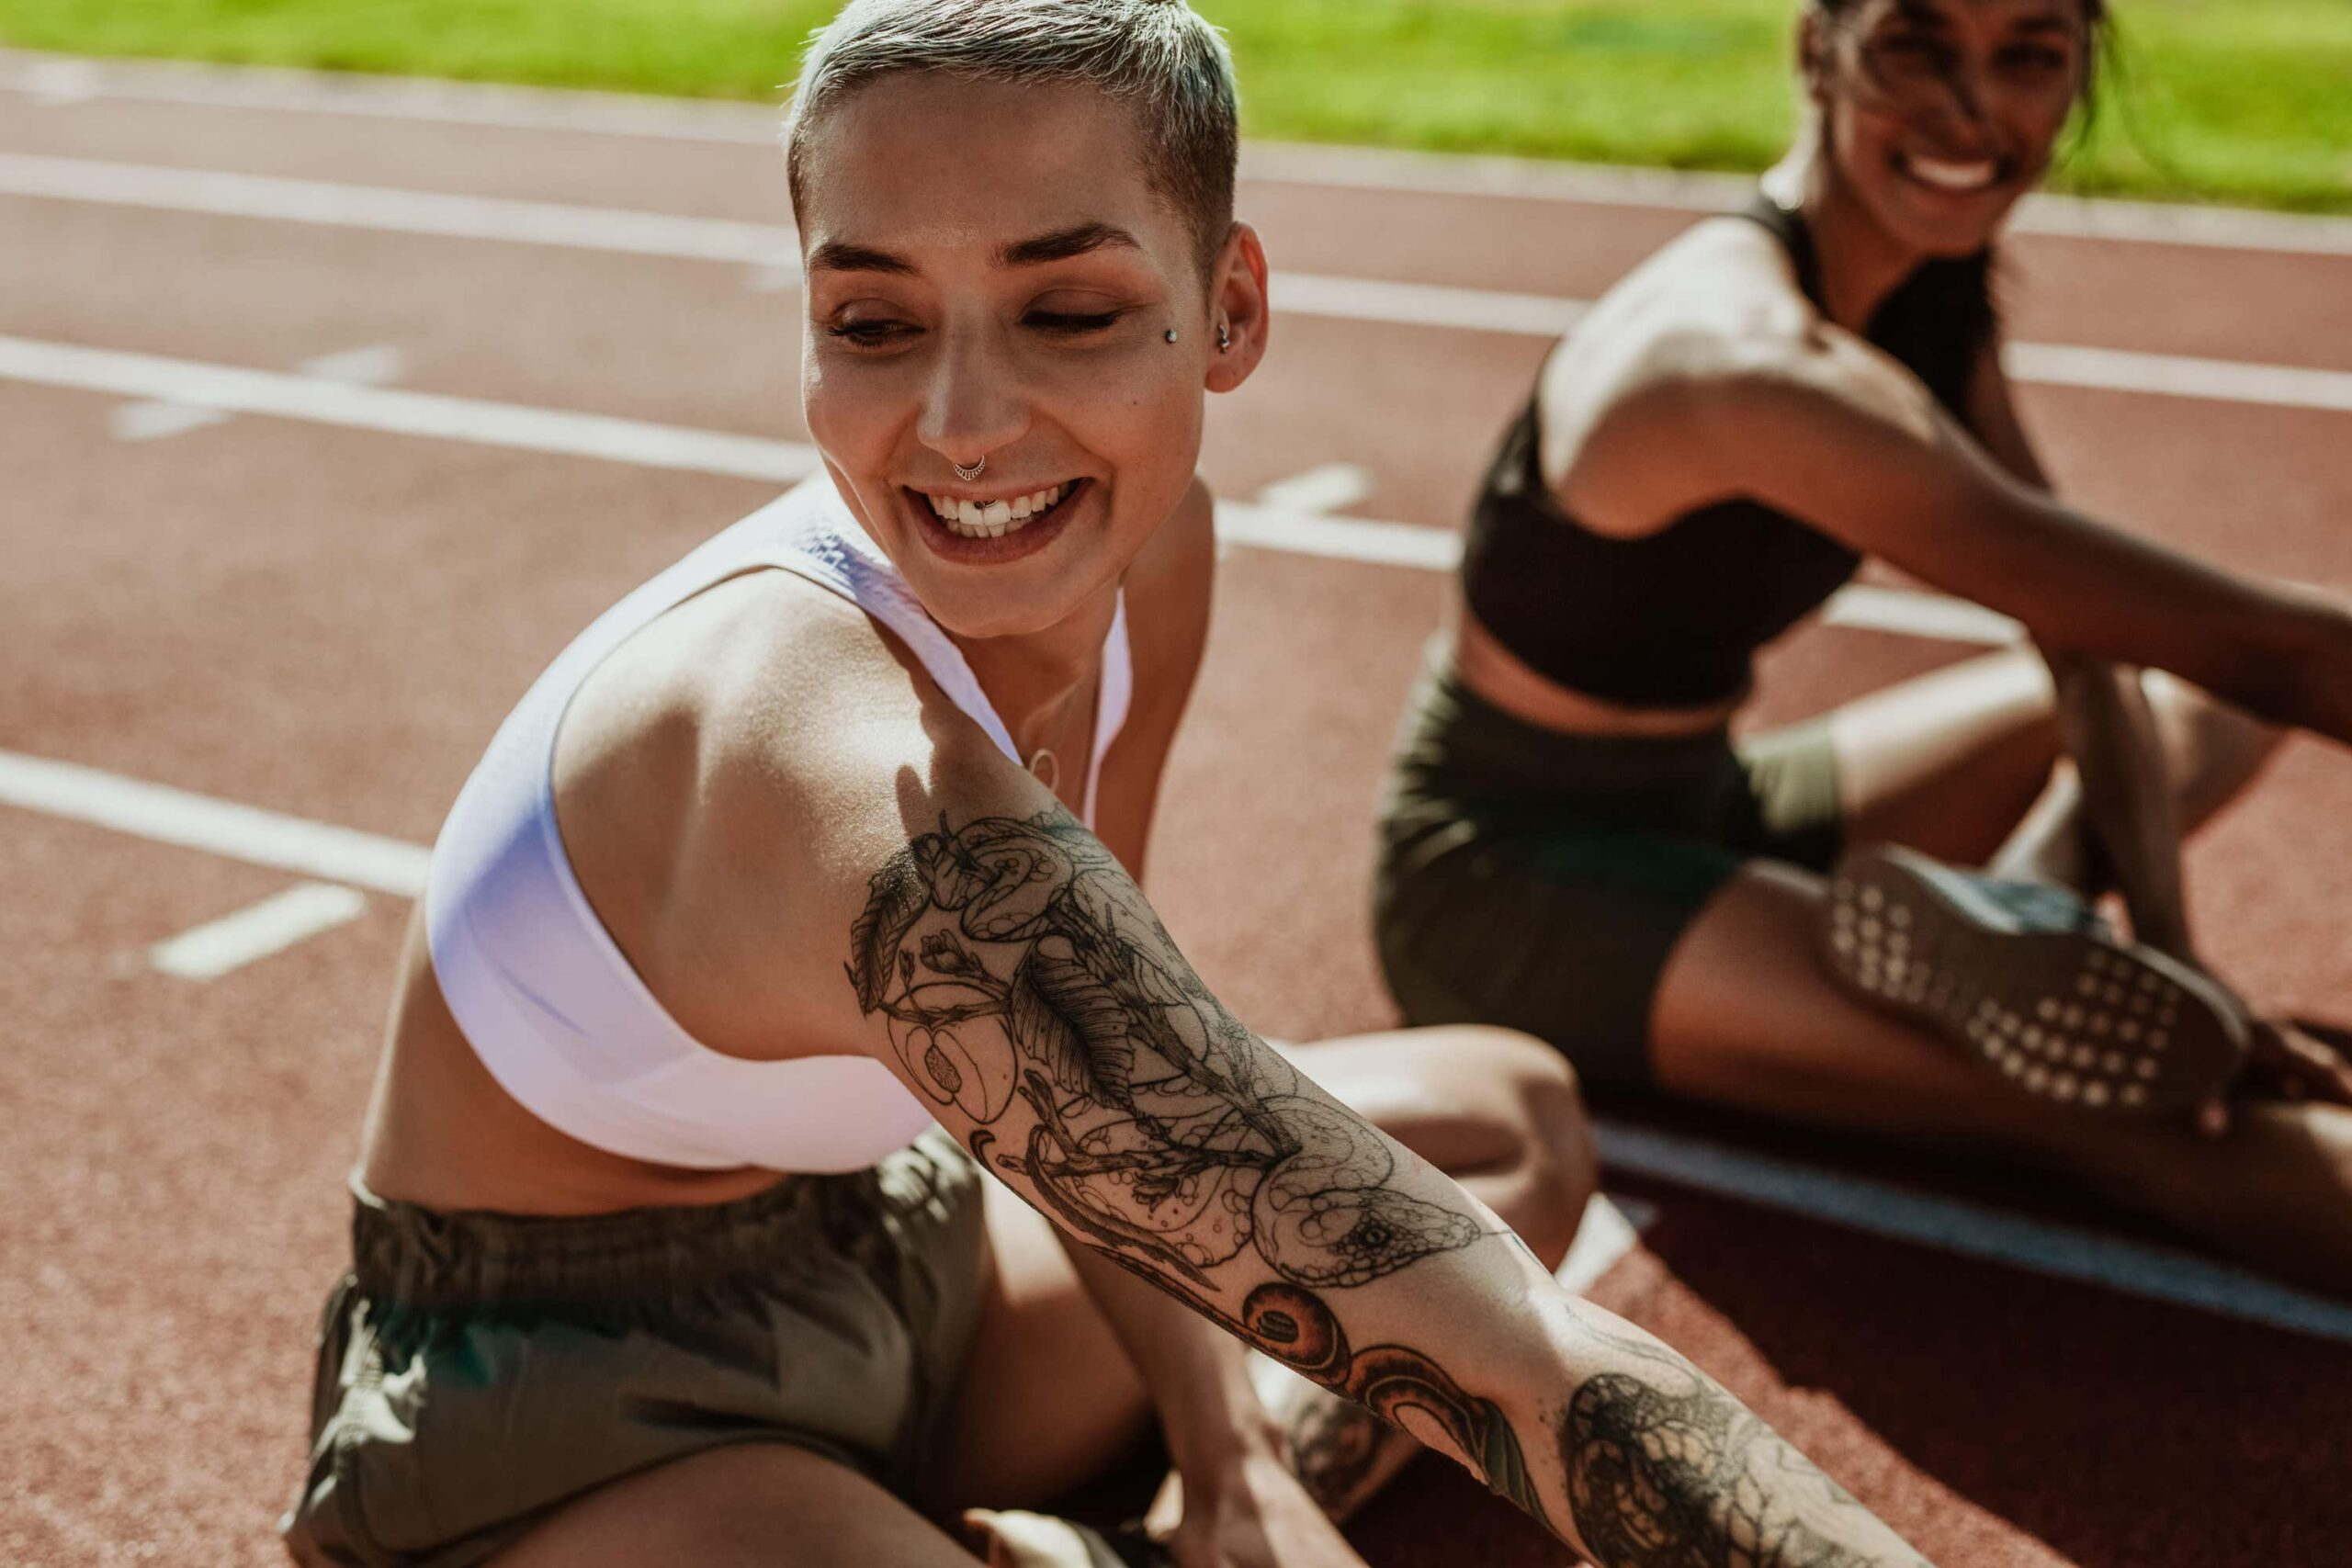 half-marathon training plan